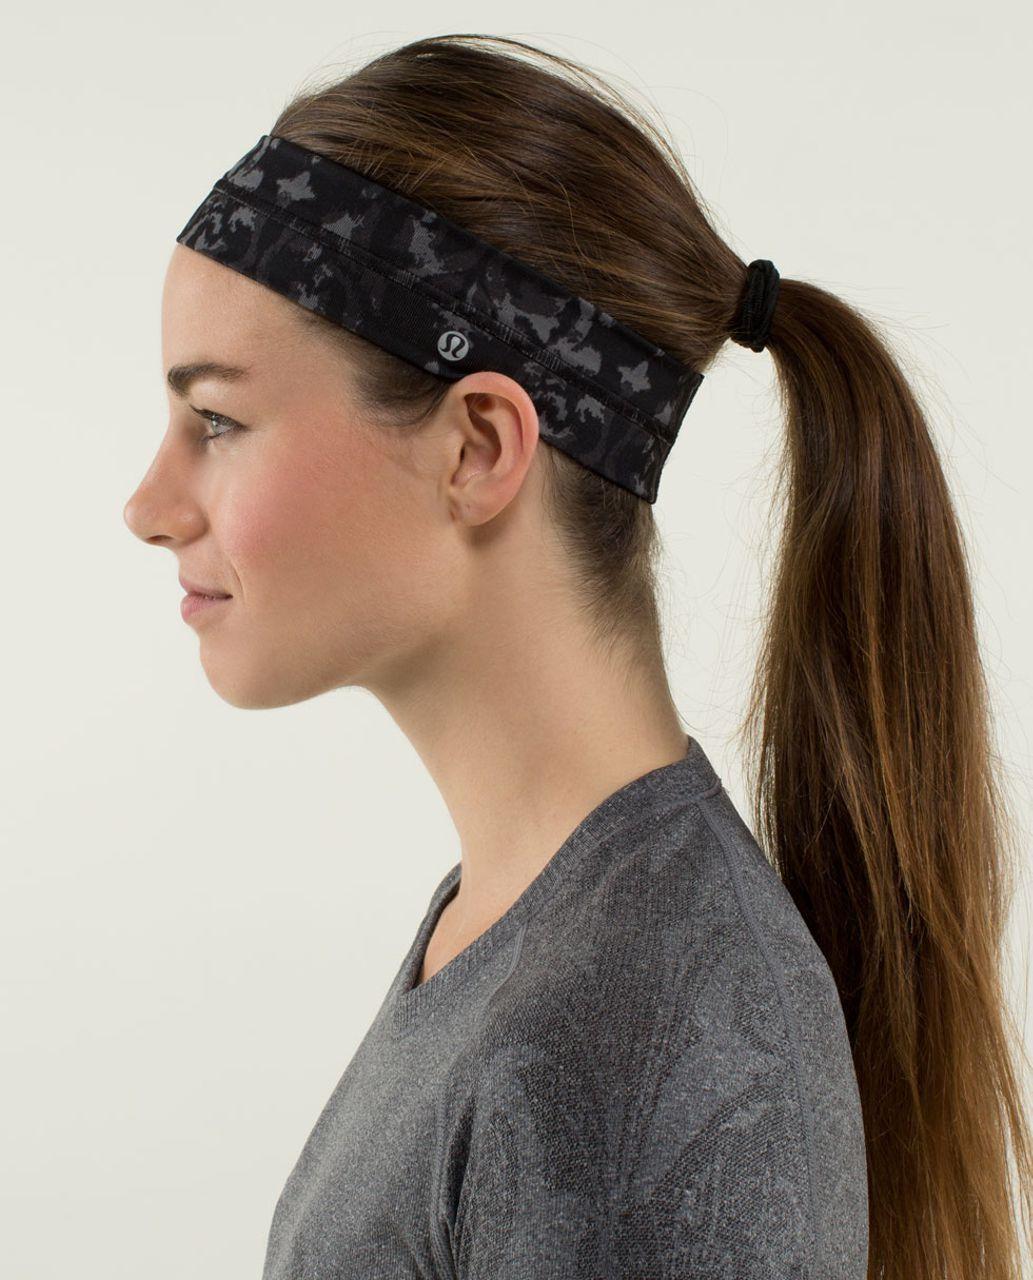 Lululemon Fly Away Tamer Headband - Beautiful Baroque Black